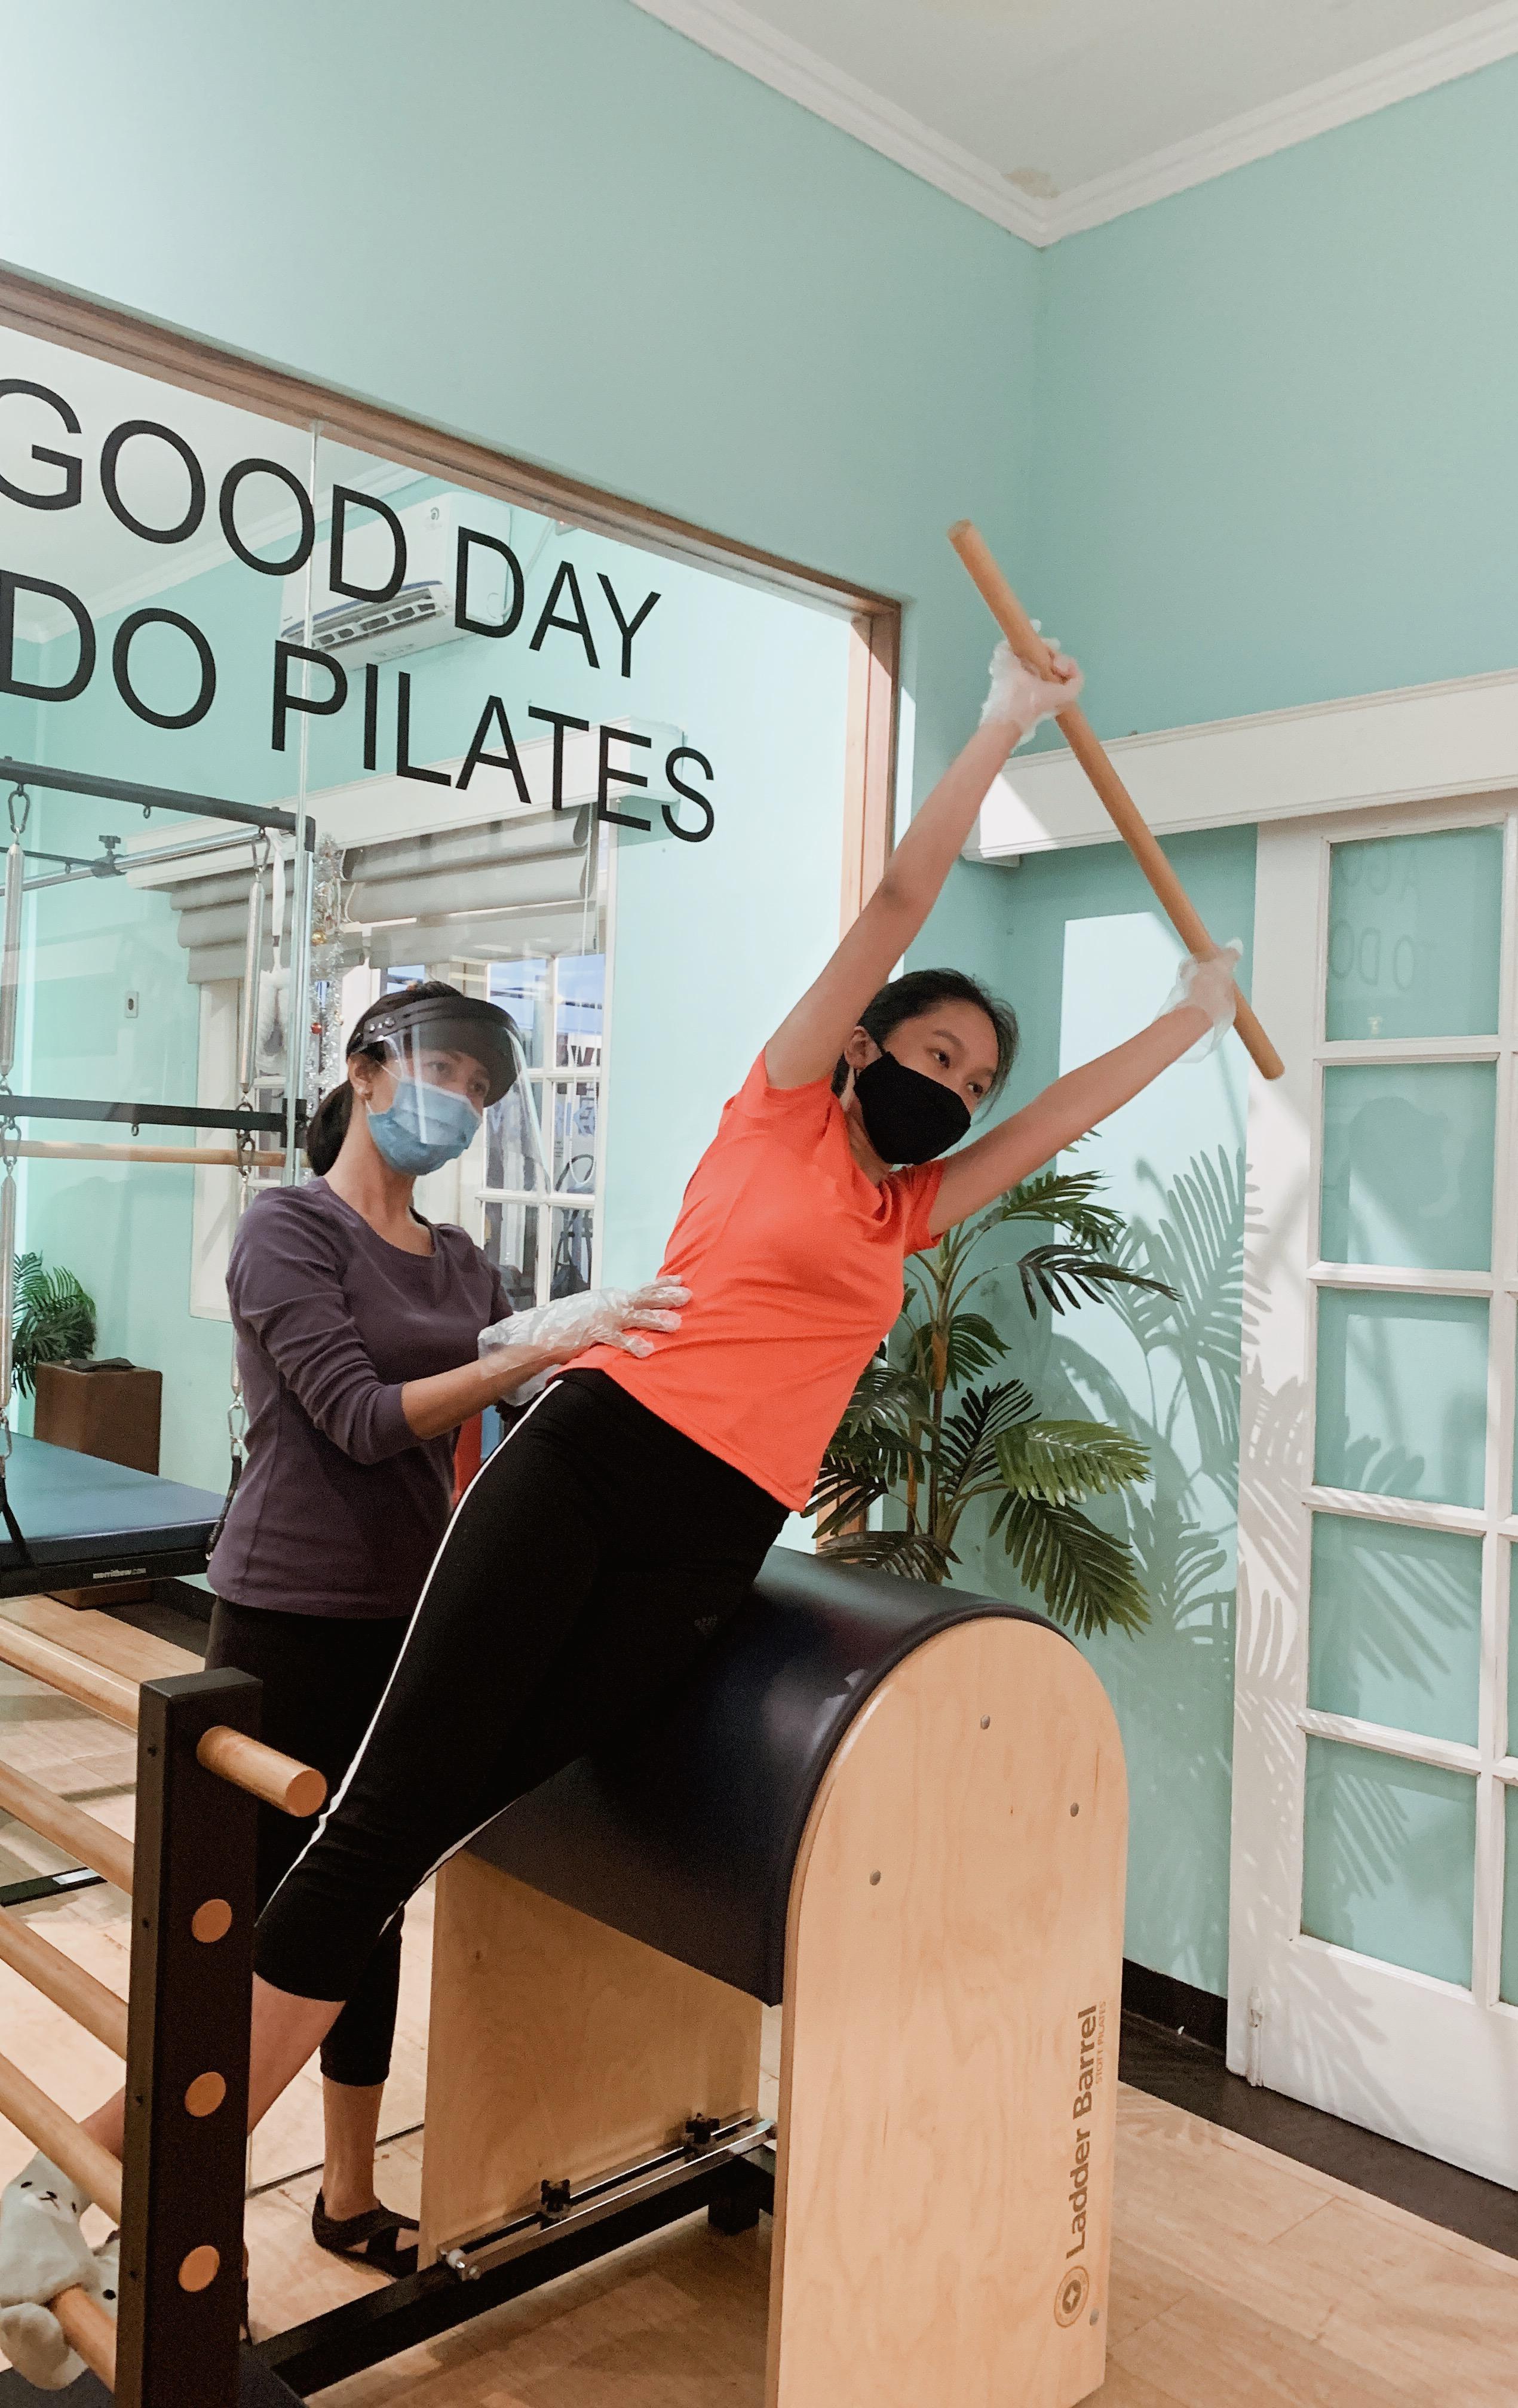 Manfaat Pilates: Meningkatkan Kekuatan Otot Inti